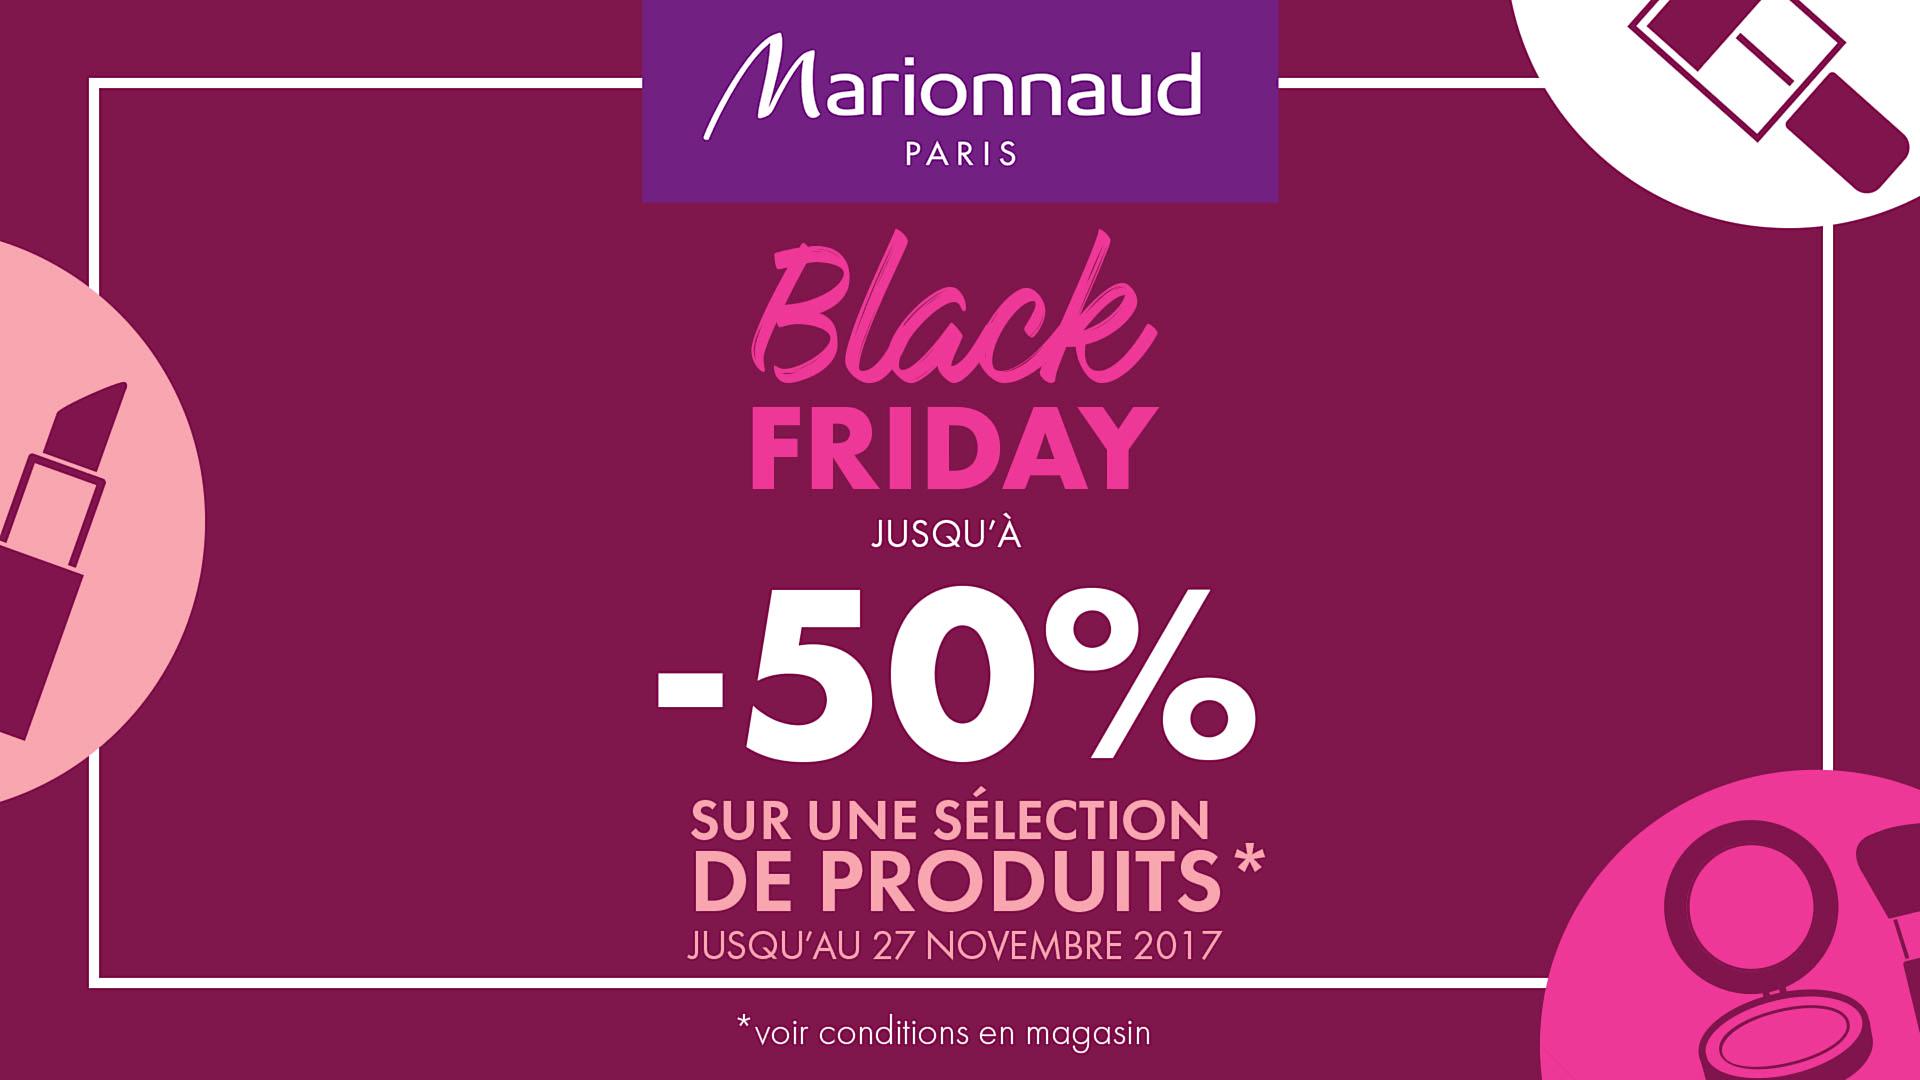 Régional Marionnaud Black Commercial FridayCentre Evry2 oBexdC